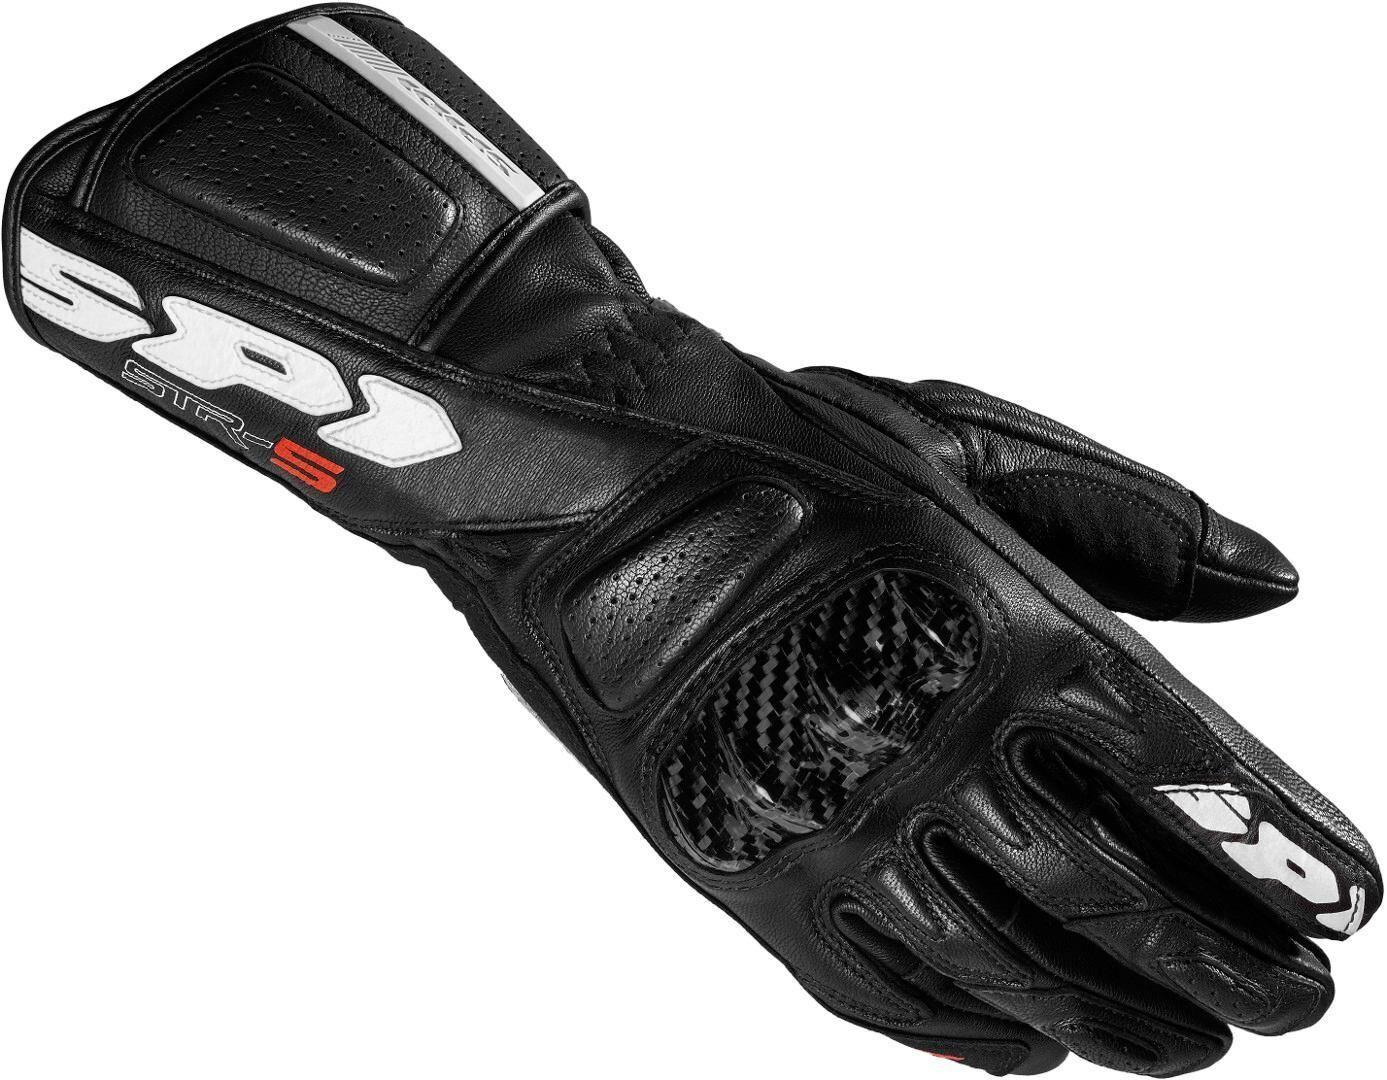 Spidi STR-5 Ladies Motorcycle Gloves Black XS